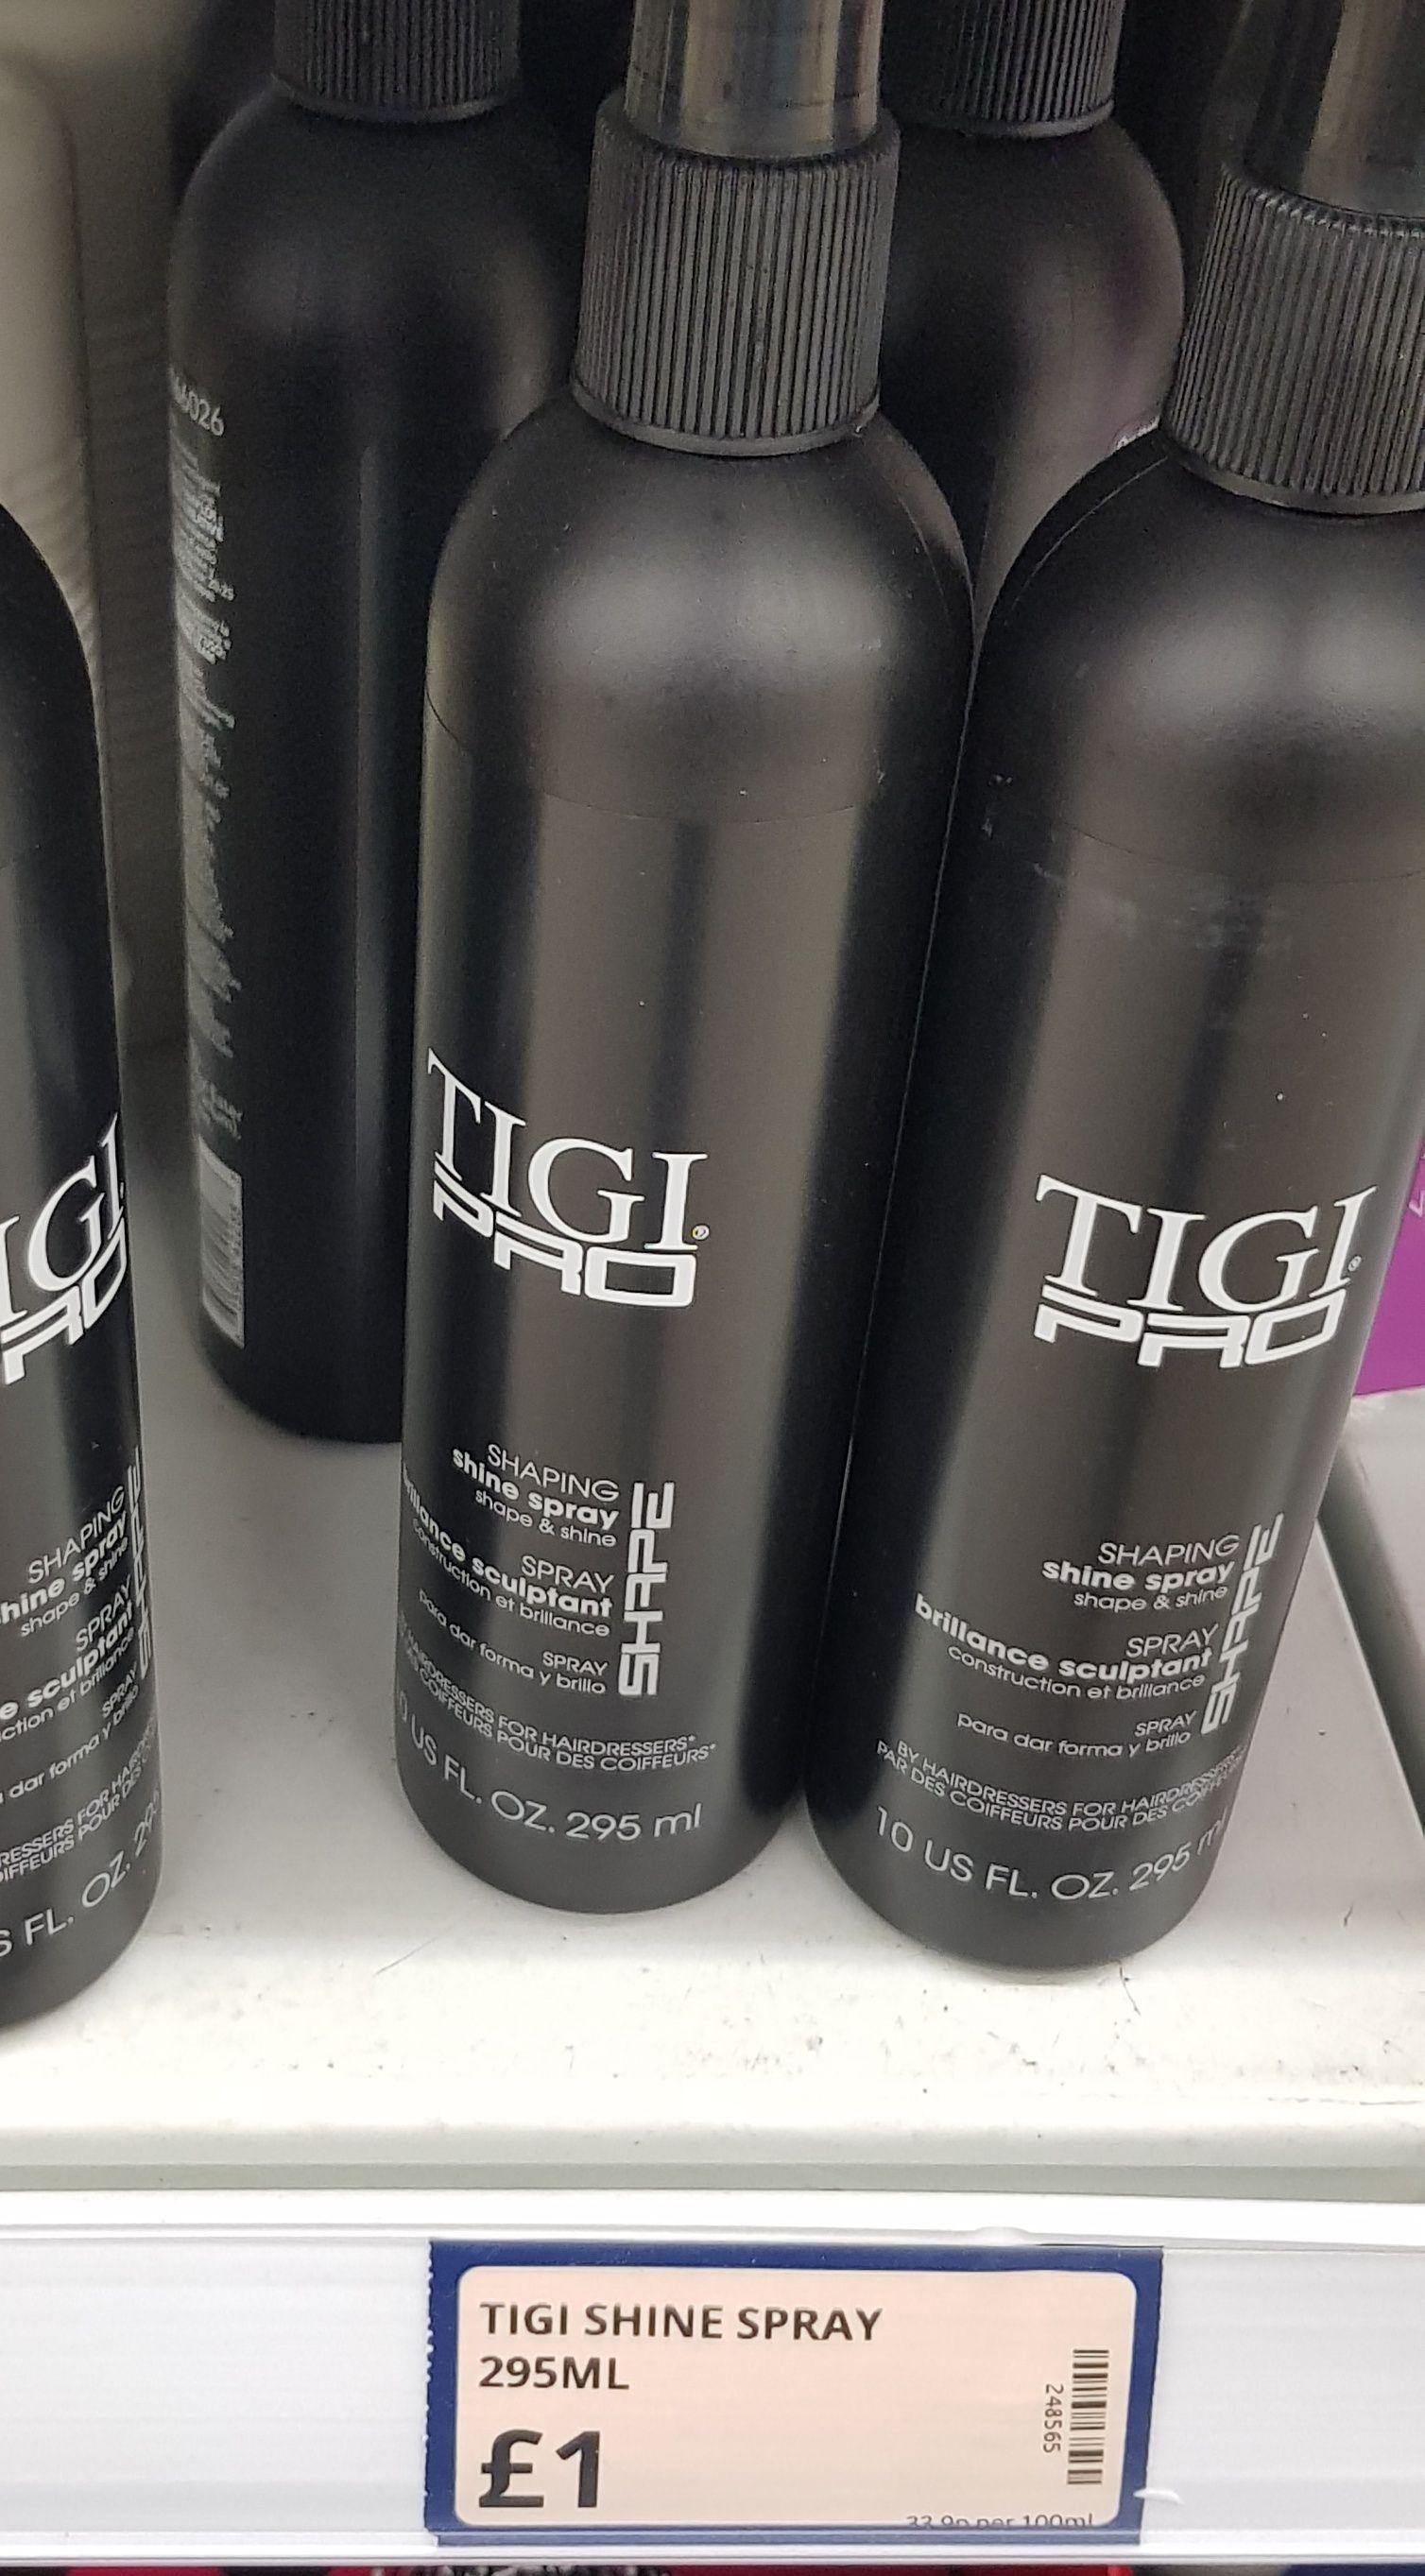 Tigi Pro shaping shine spray £1 @Poundstretcher (in store - Keighley)